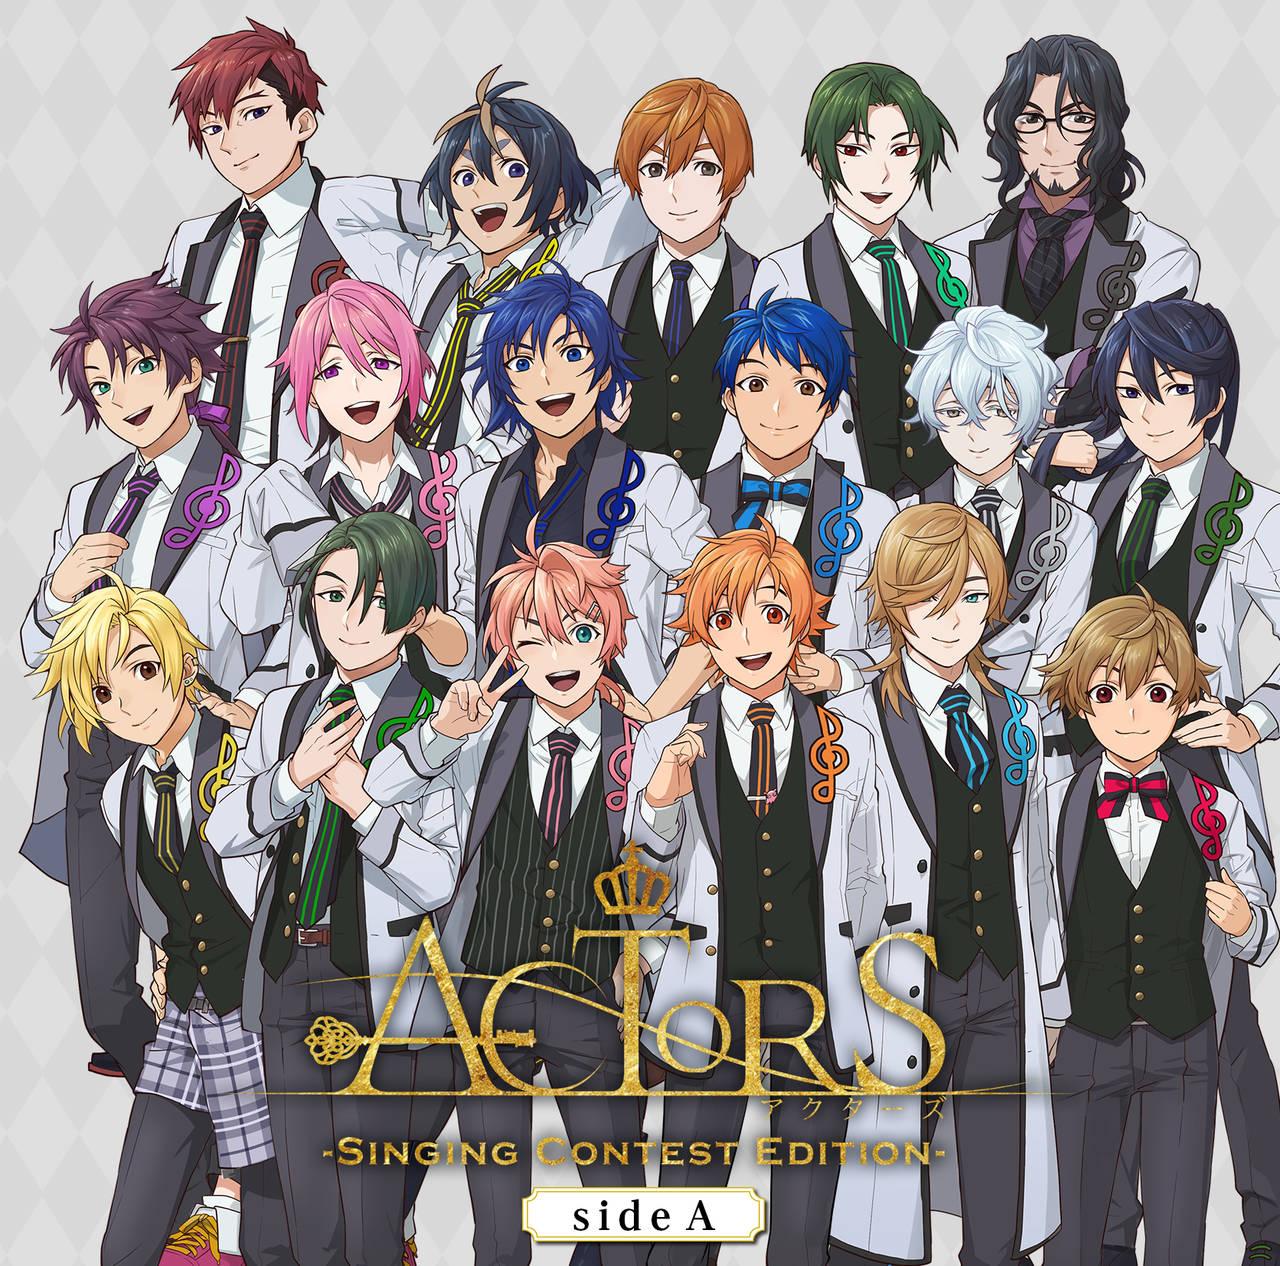 『ACTORS(アクターズ)』シリーズ最新作が配信開始! ユーザー参加型の歌唱コンテストを開催!